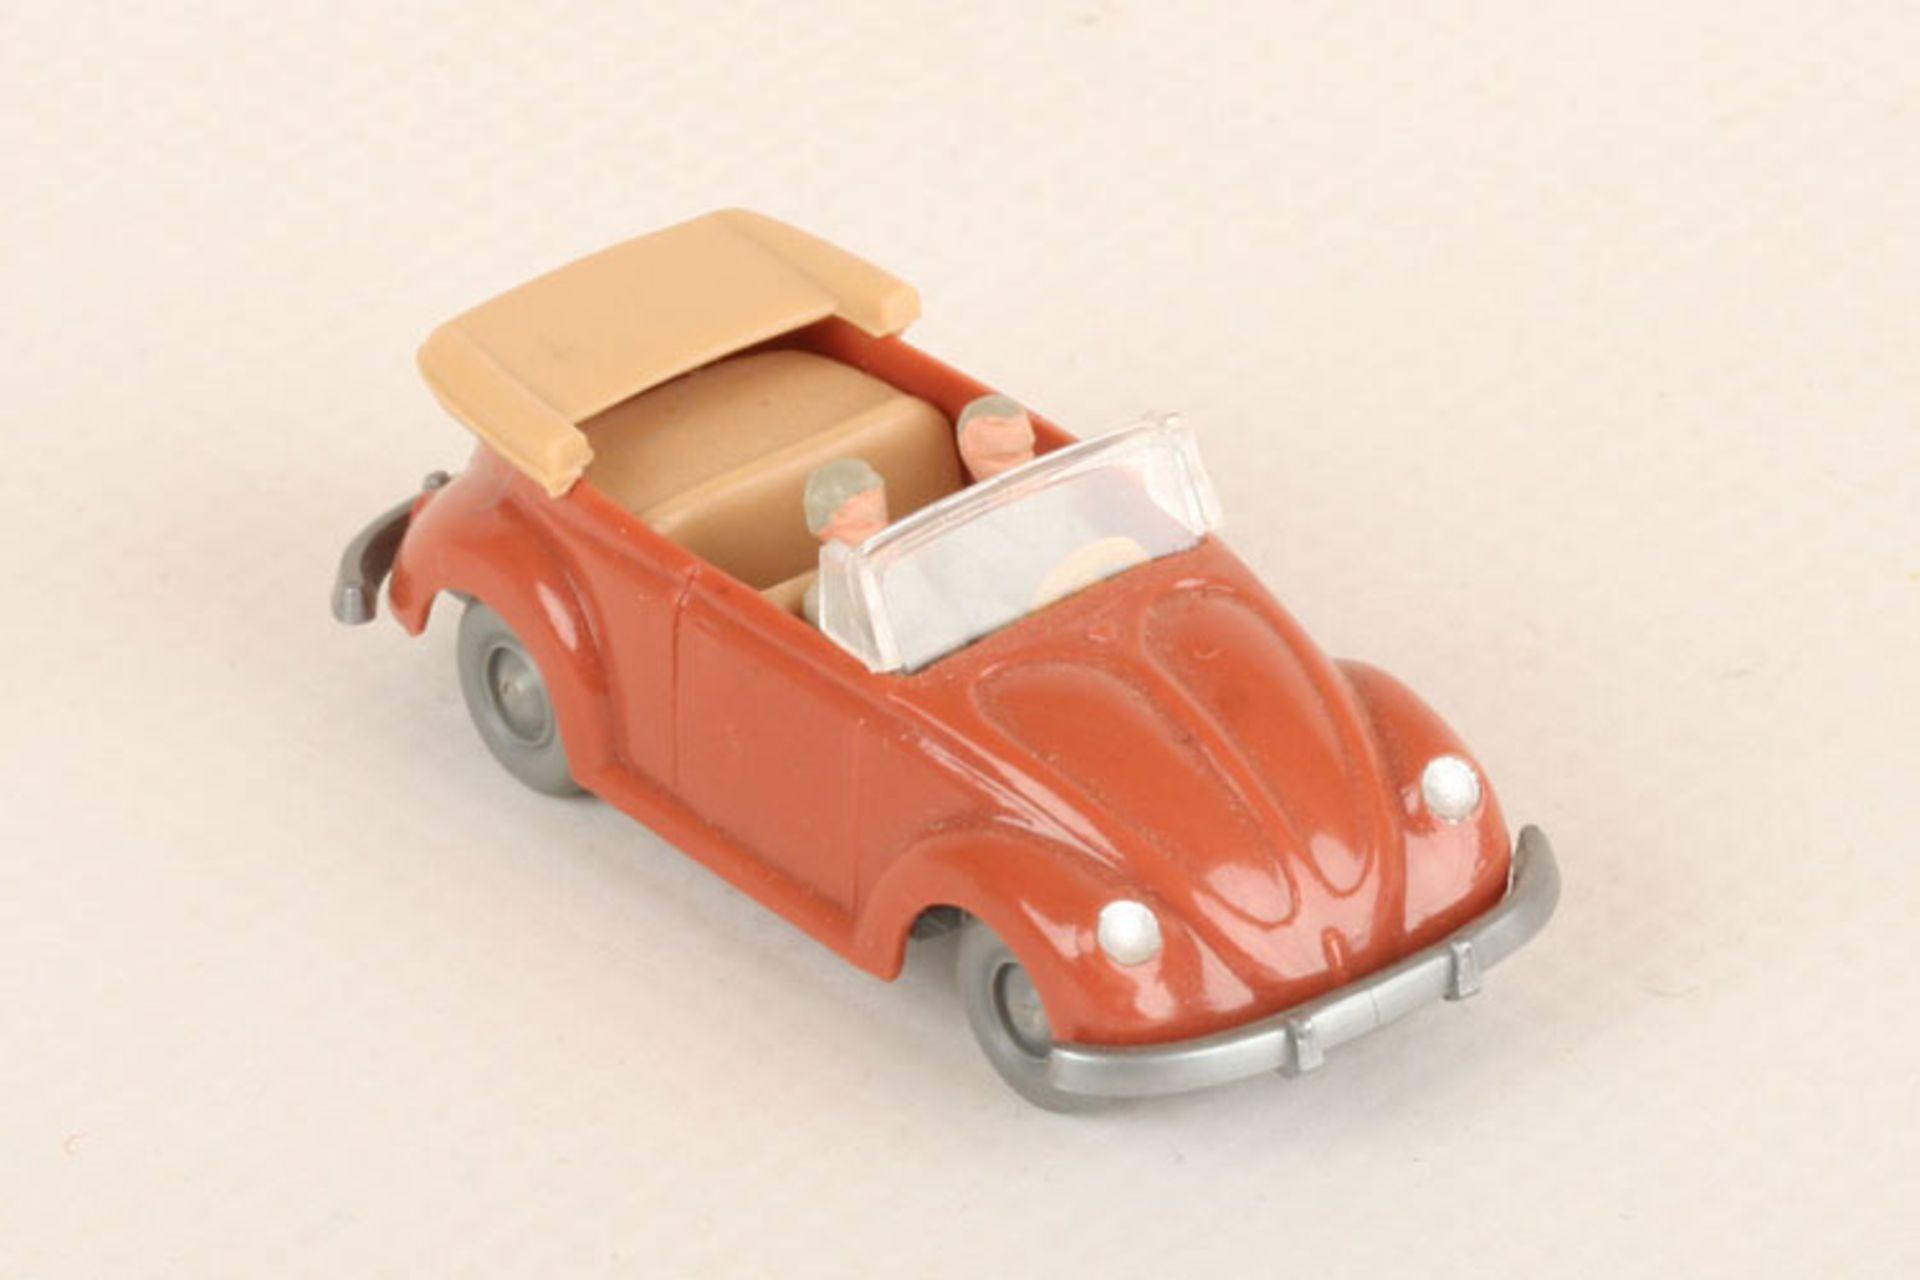 Los 1012 - Wiking VW Käfer Cabrio korallenrot 33/6a, IE beige, neuwertig